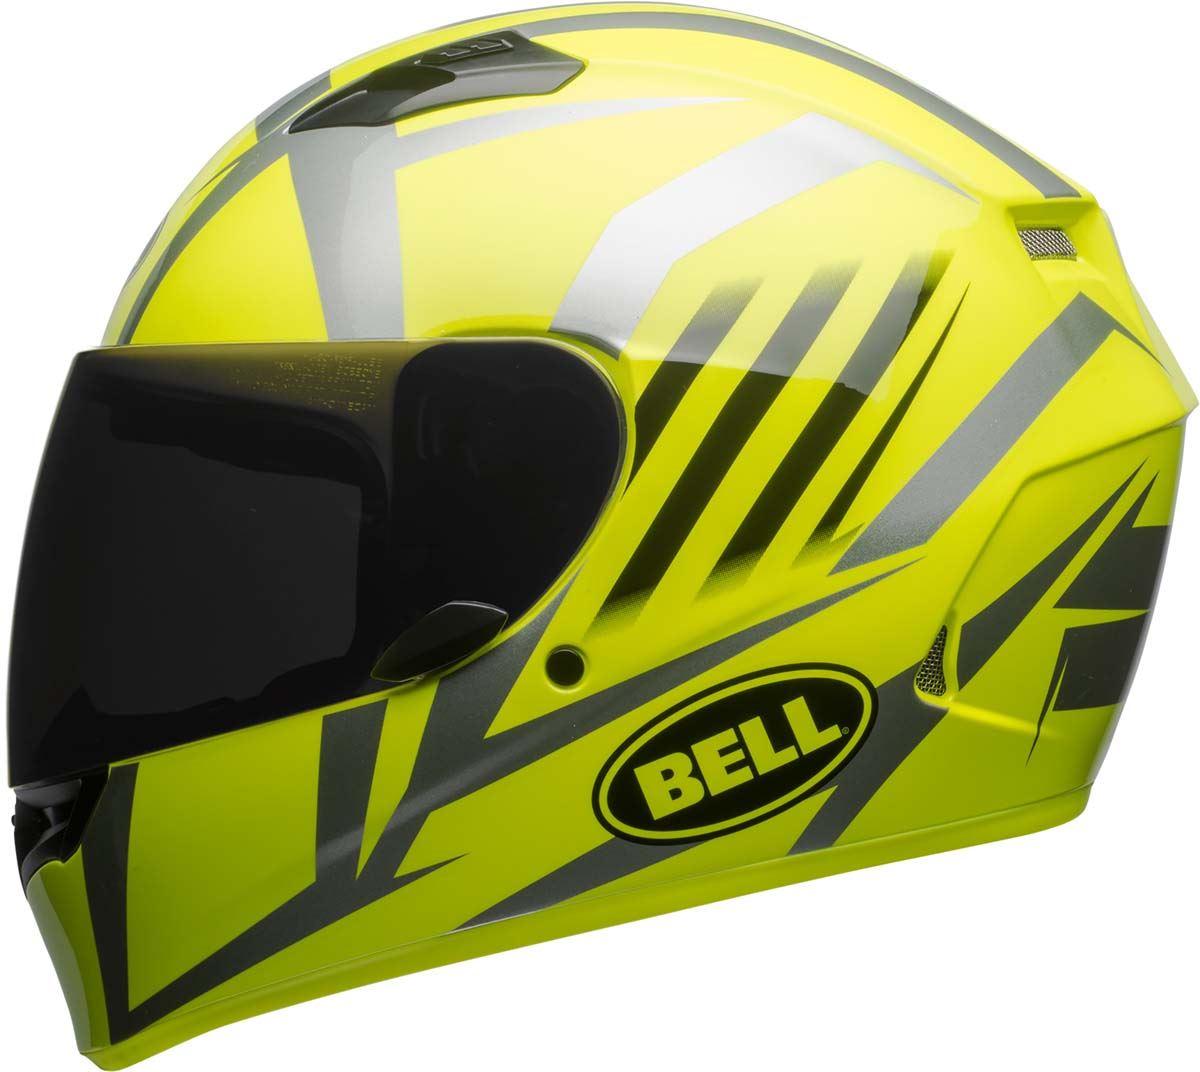 Bell-Qualifier-Helmet-Full-Face-Motorcycle-Clear-Shield-DOT-XS-3XL miniature 41